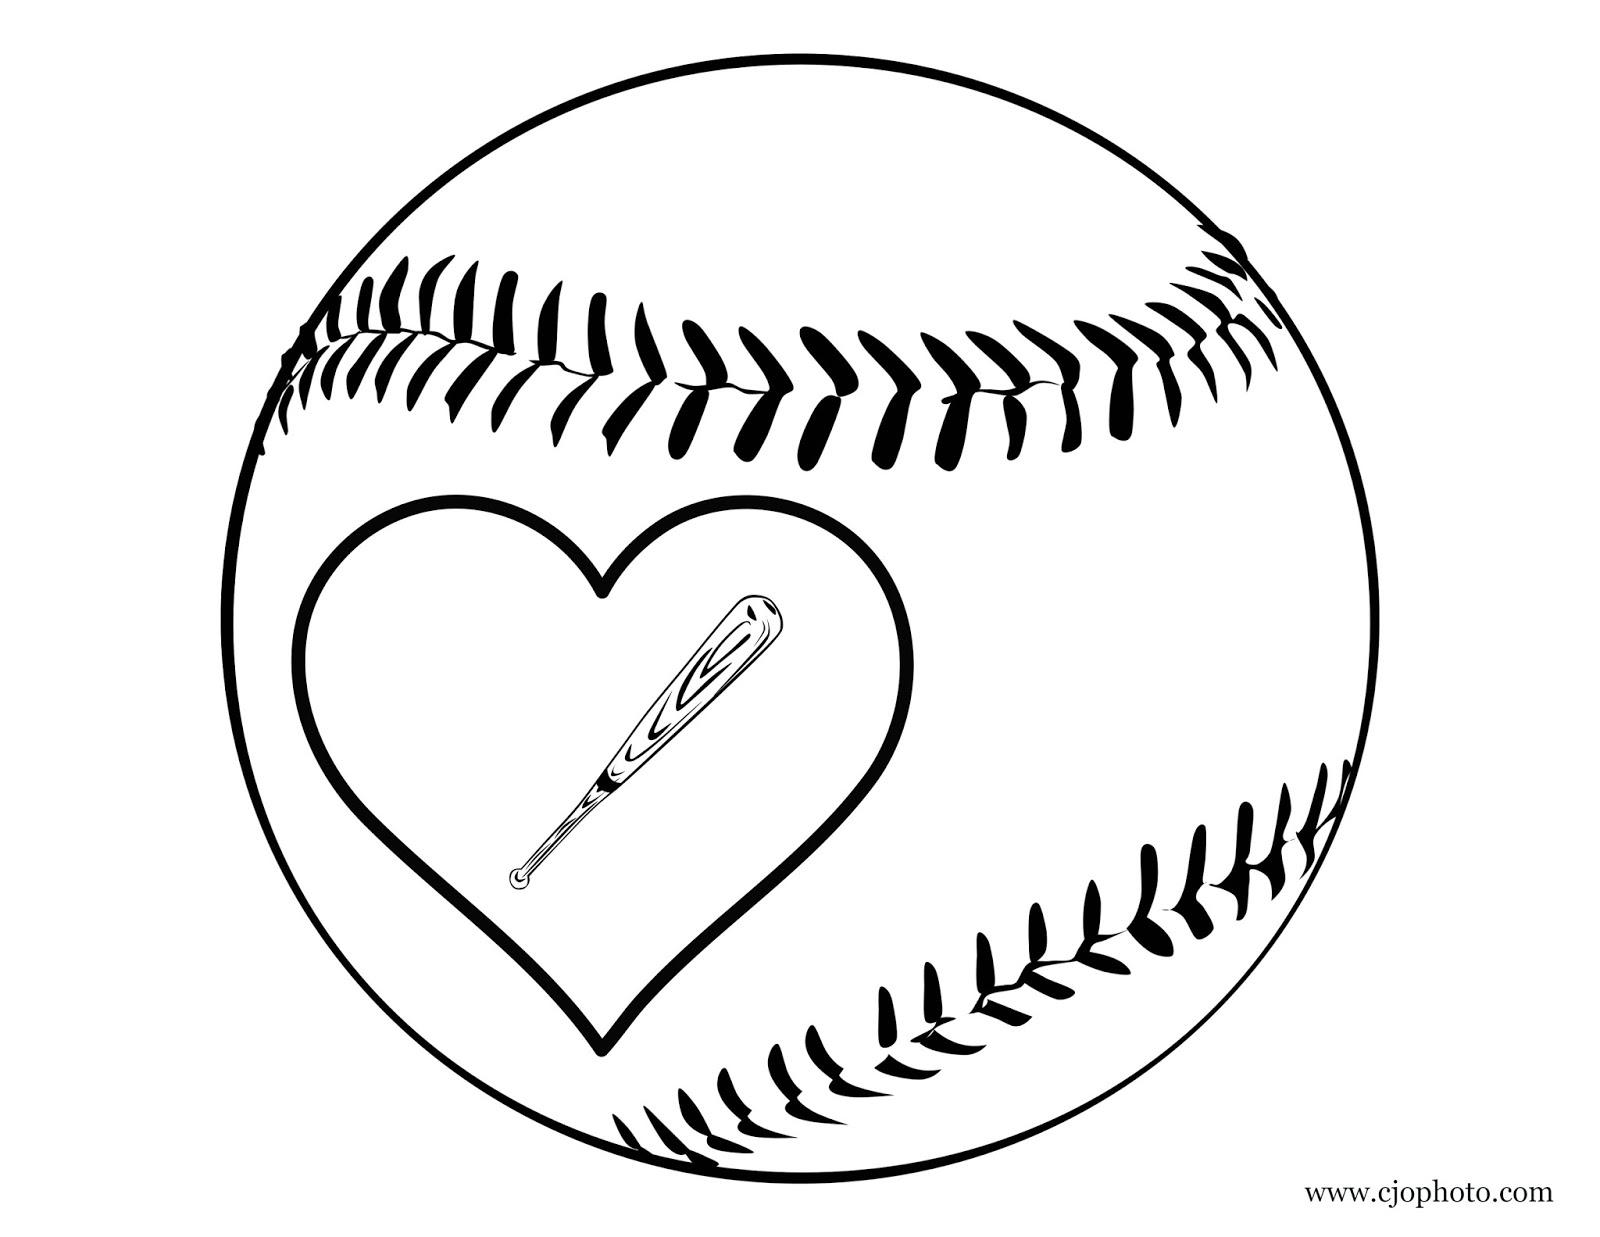 CJO Photo: Heart Baseball Coloring Page